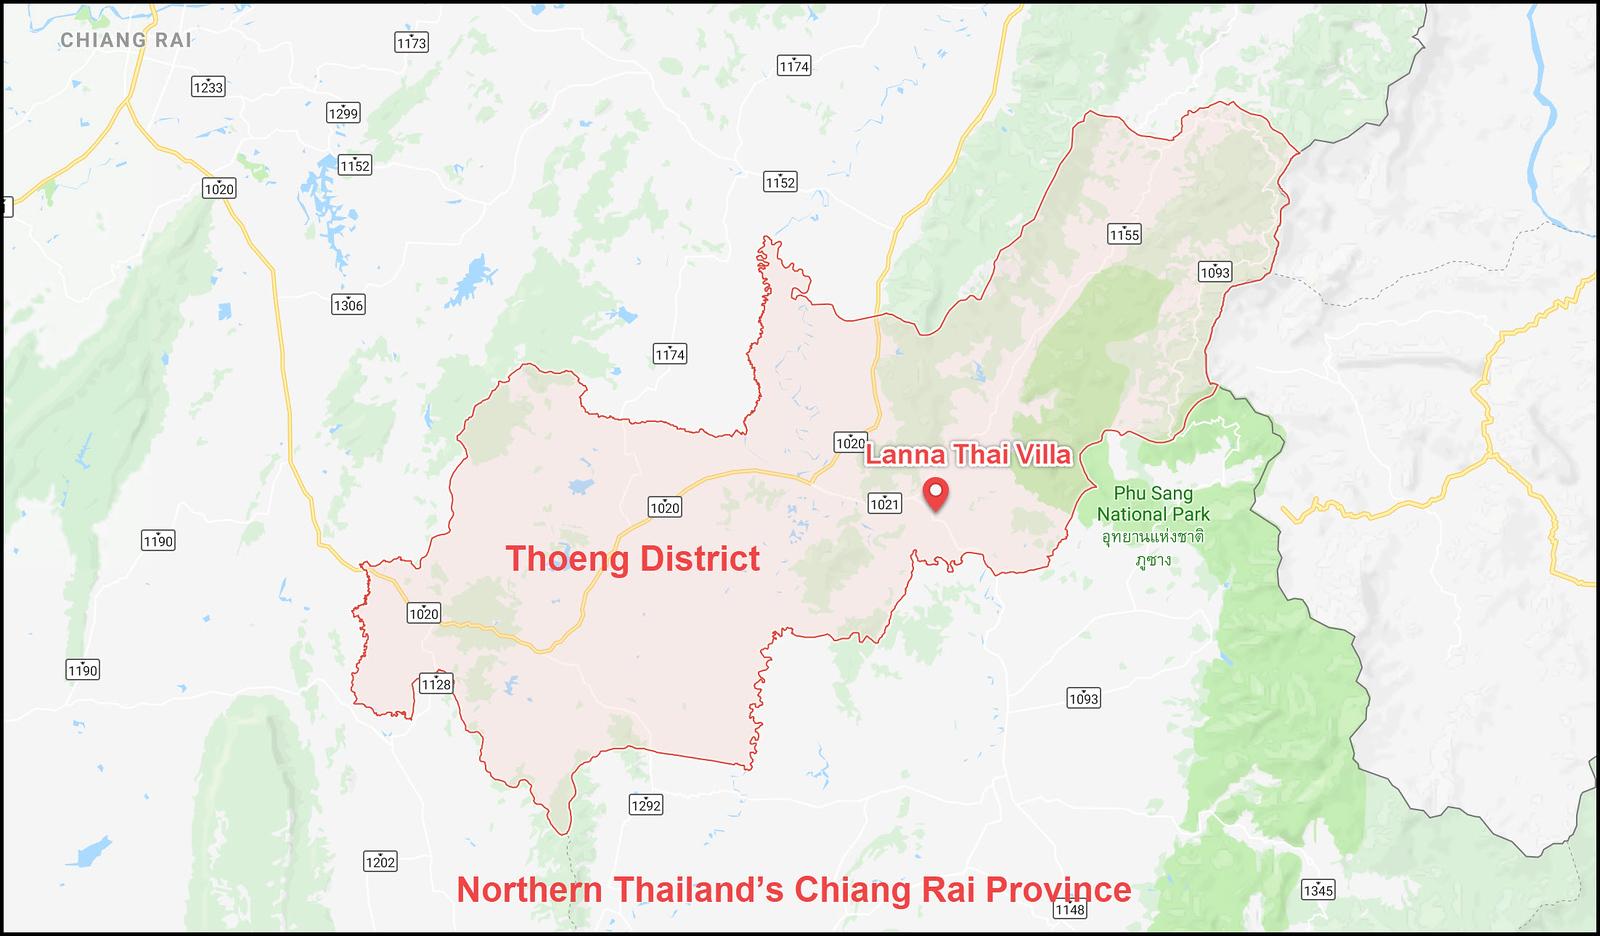 Understanding Thailand's Administrative Structure